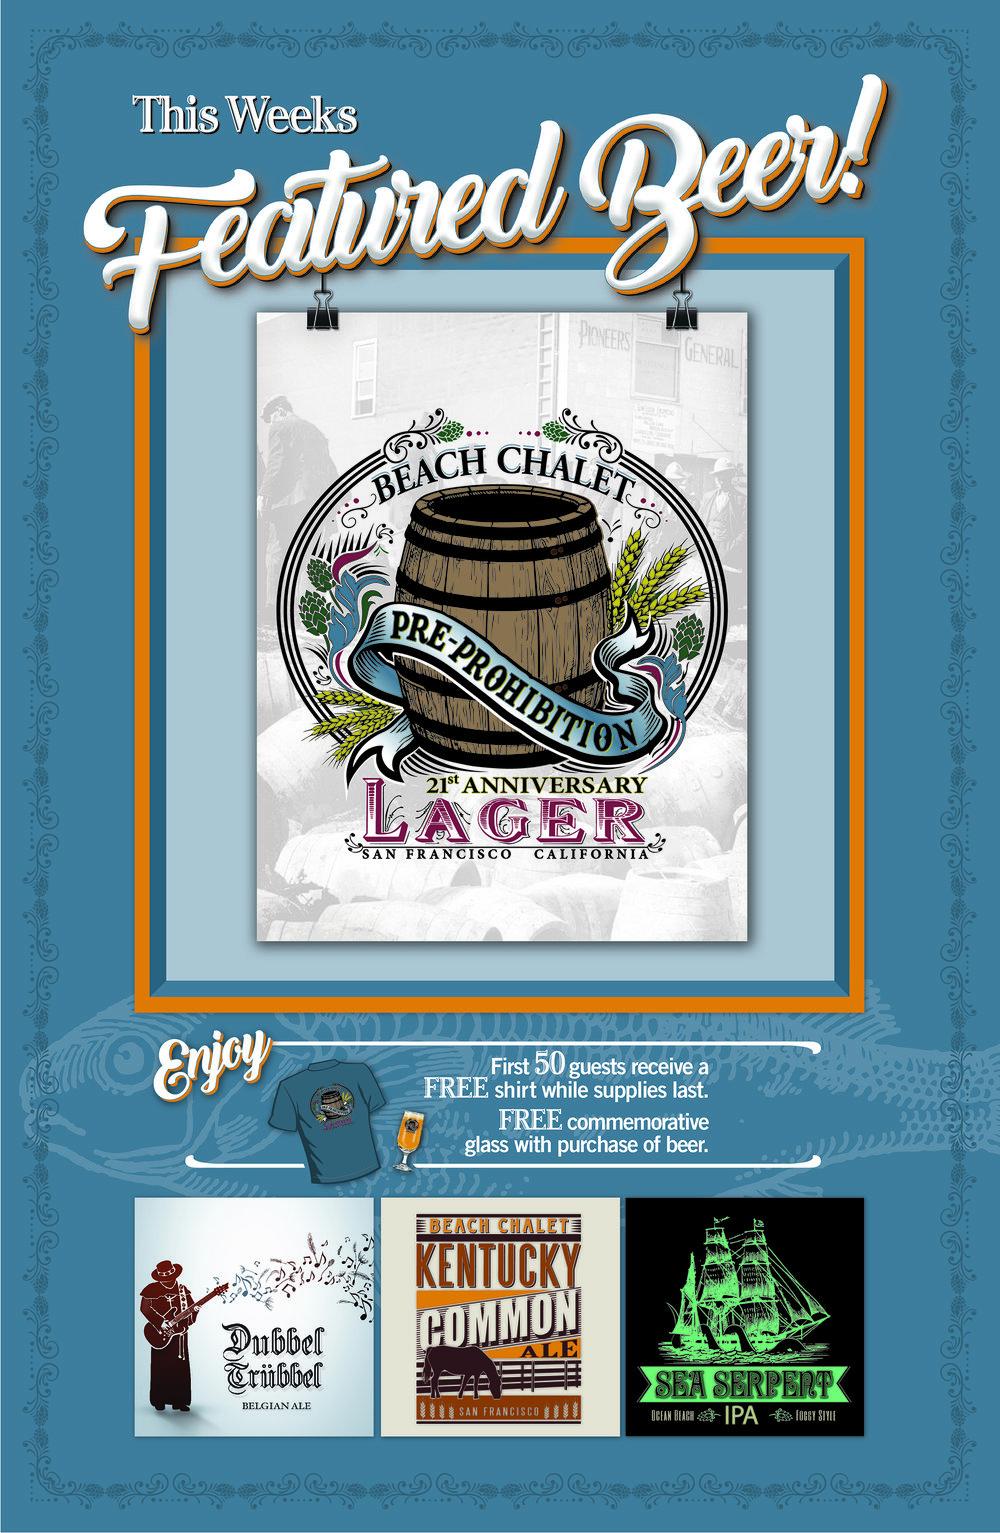 beer-Feature-Poster-02.jpg